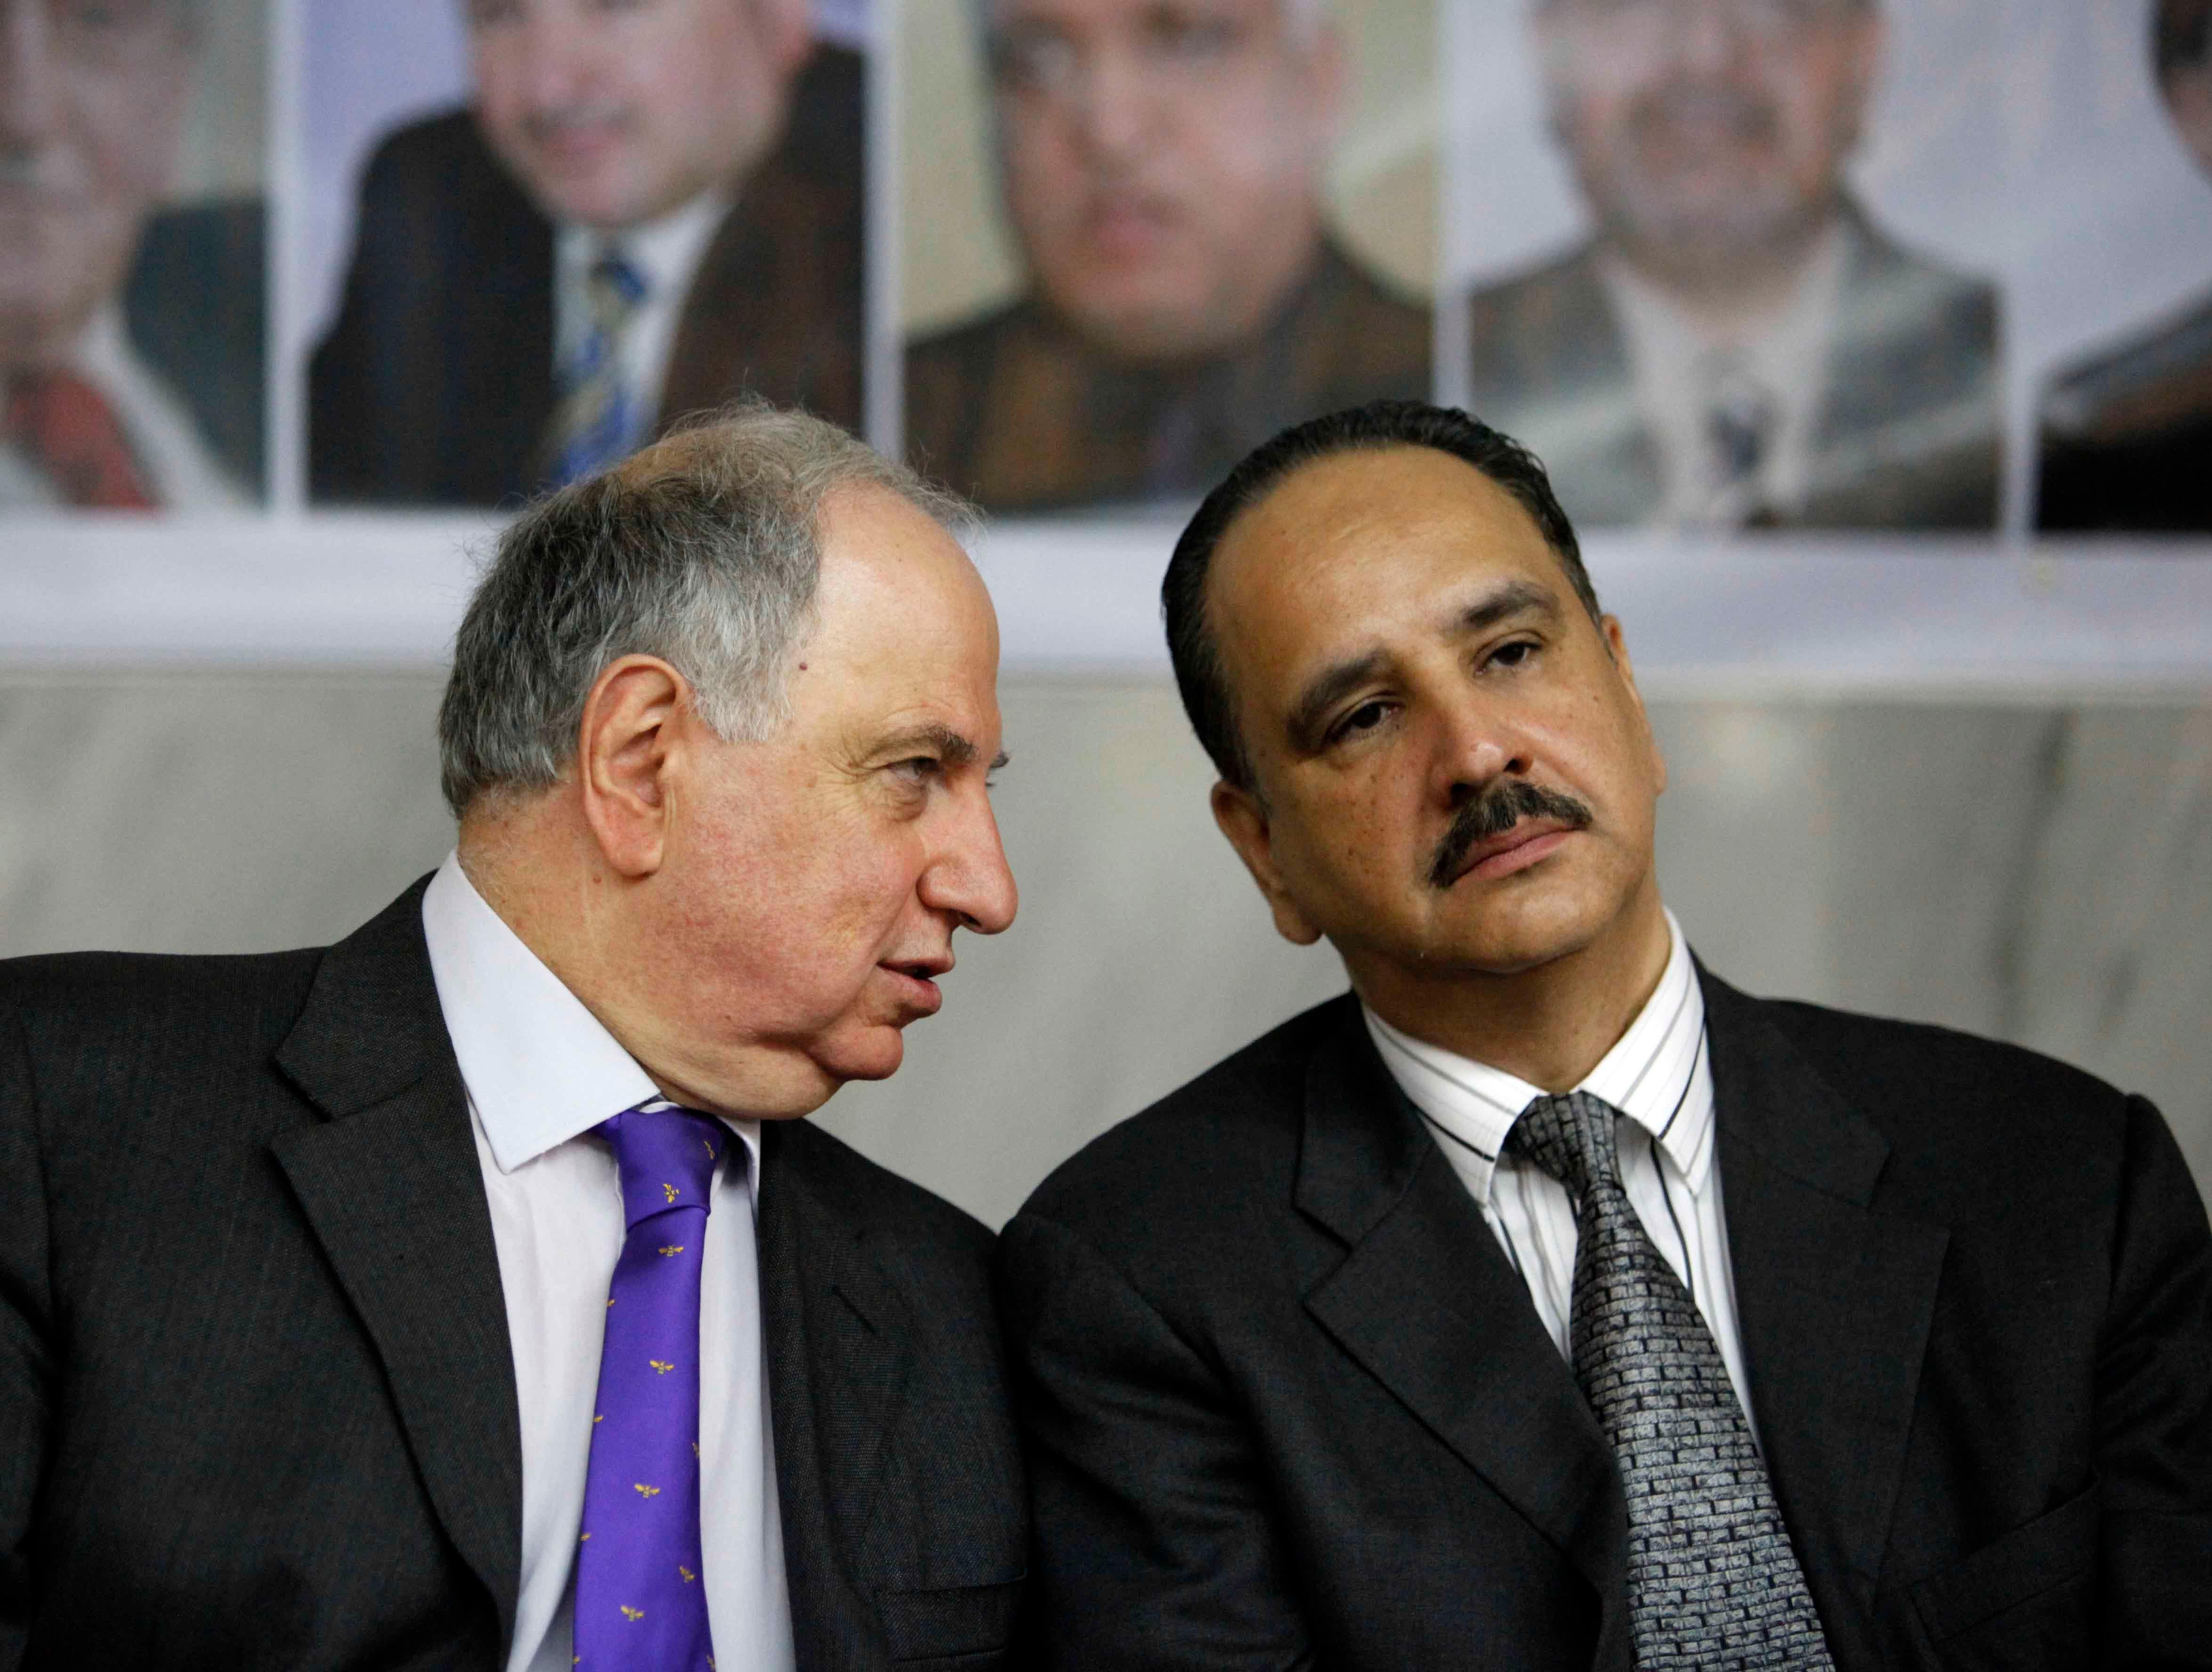 Ahmed Chalabi